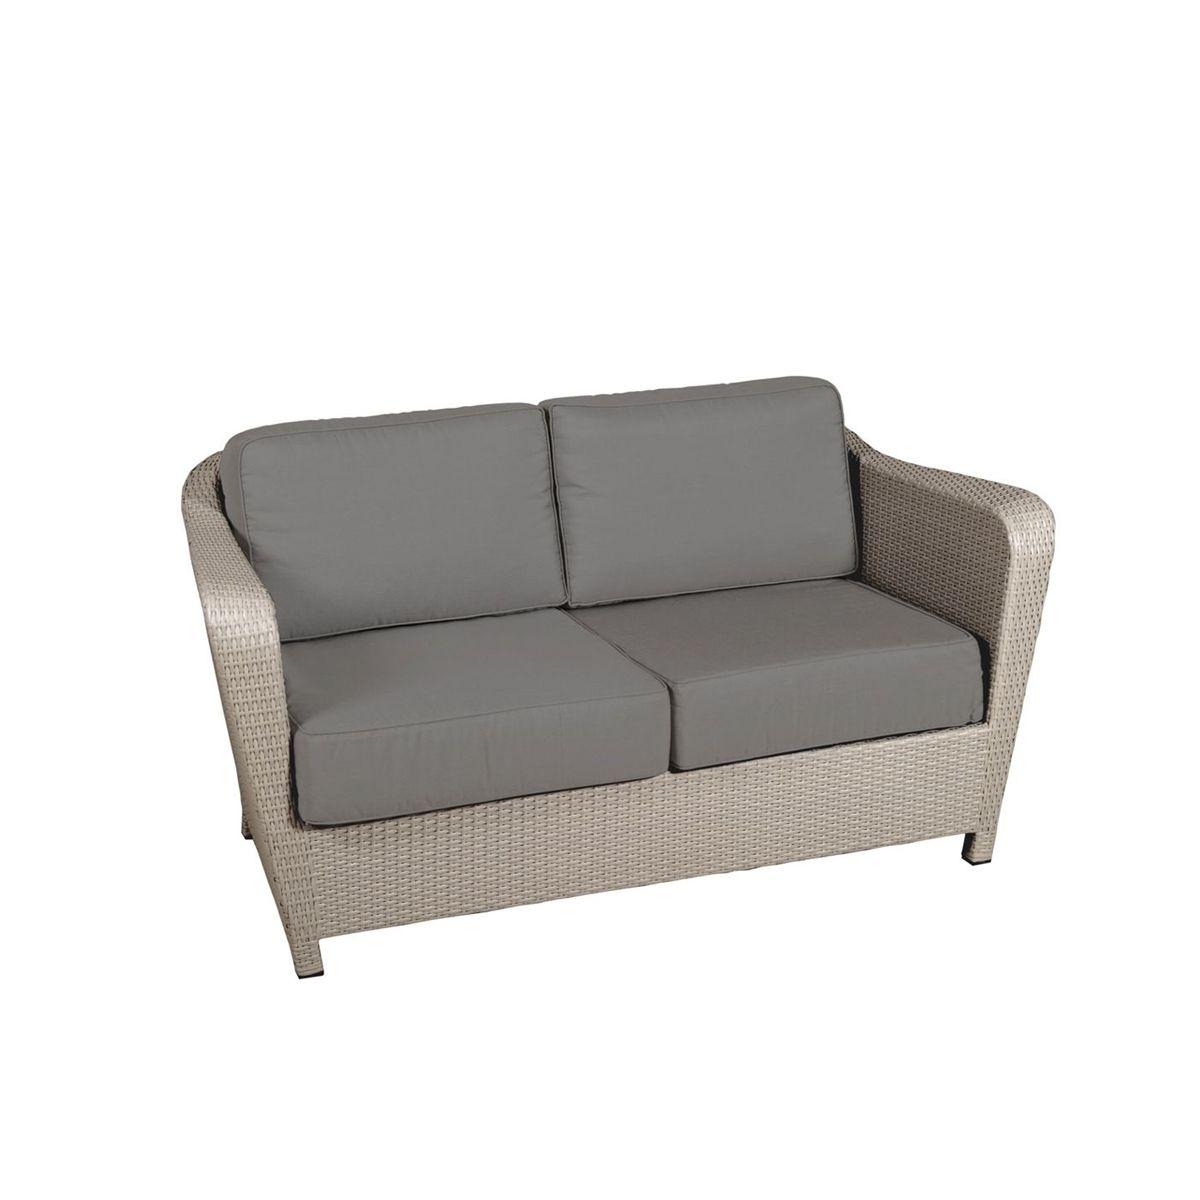 canape 2 places wicker briton sel les jardins. Black Bedroom Furniture Sets. Home Design Ideas